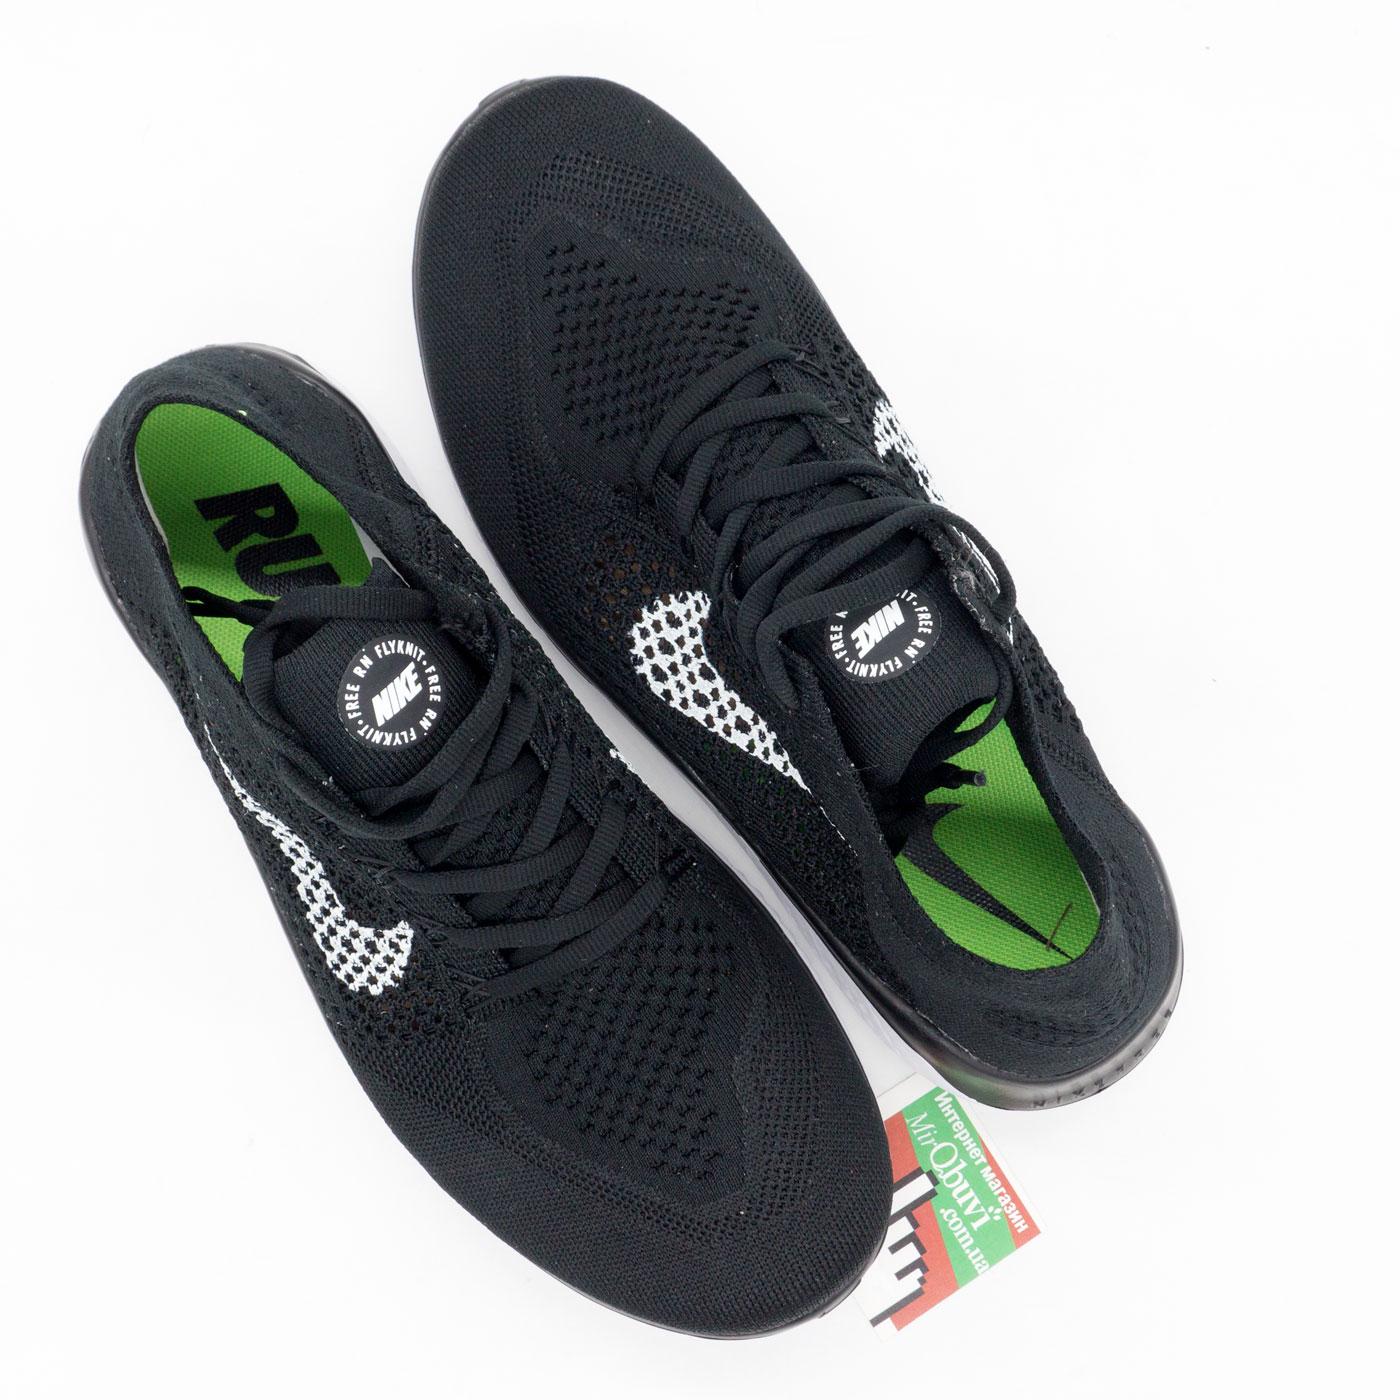 фото back Кроссовки для бега Nike Free Run Flyknit Найк Фри Ран, черно-белые back